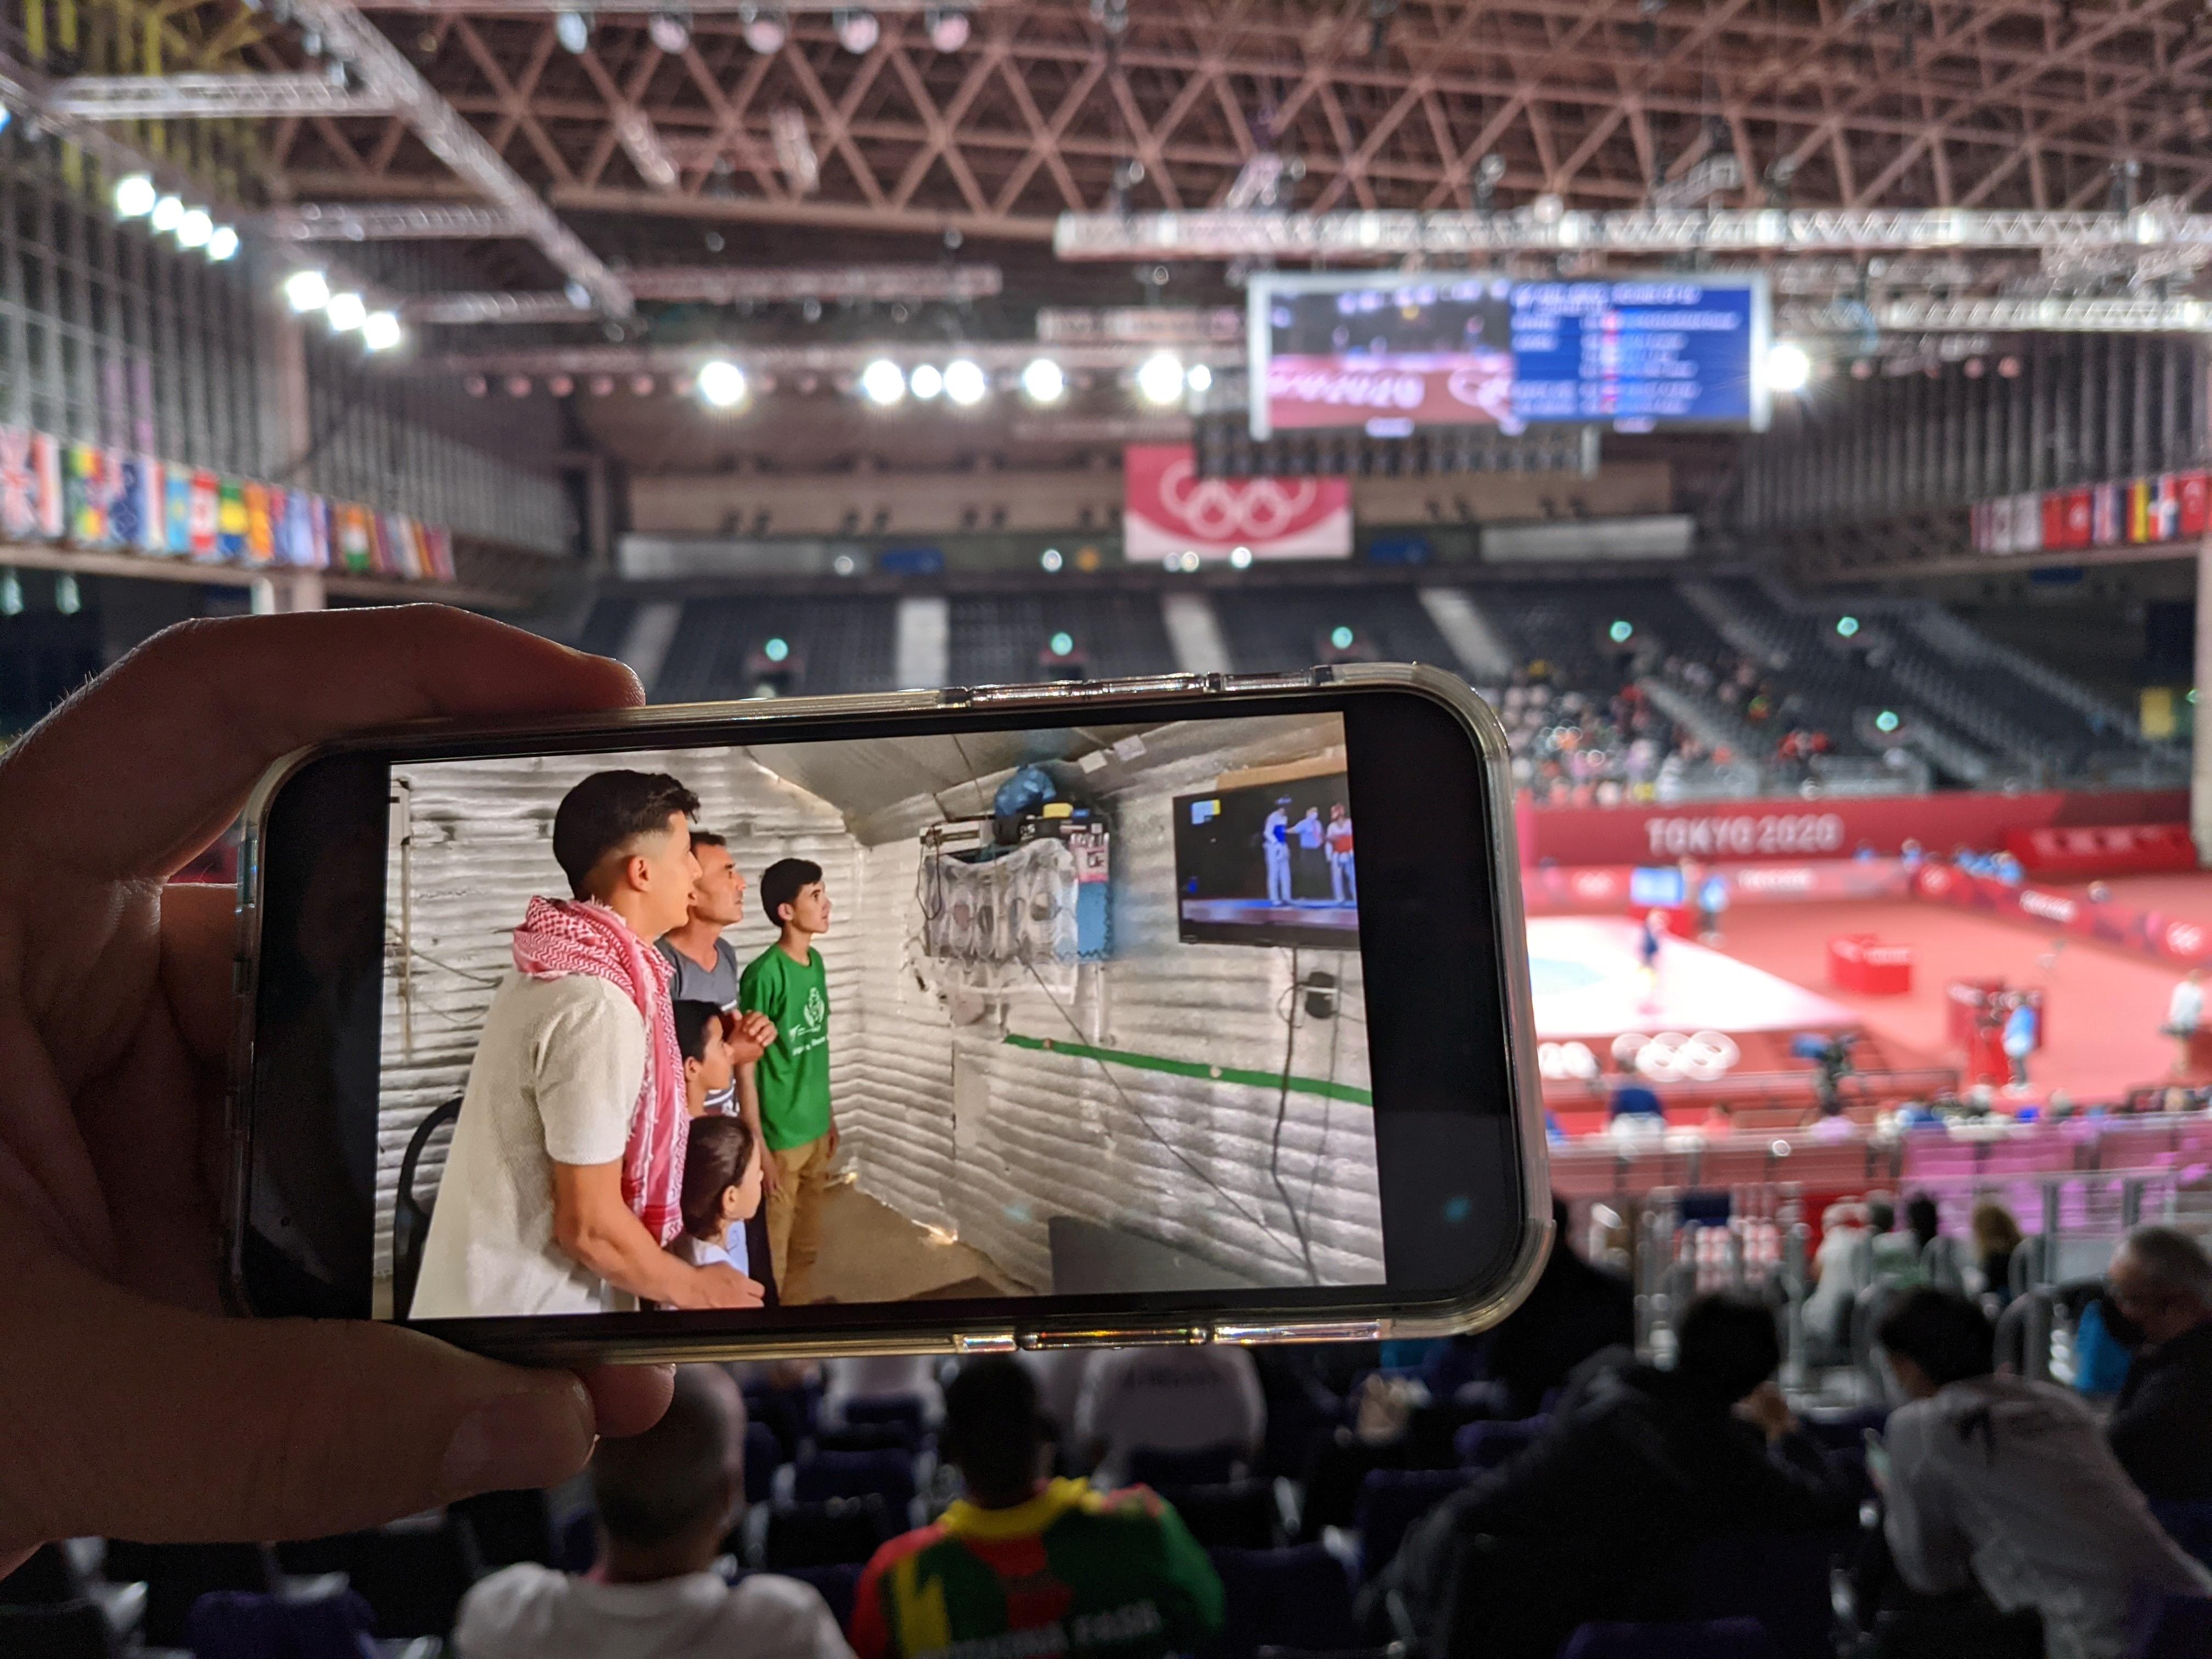 A World Taekwondo official shows a video of Syrian refugee Wael Al Faraj watching a taekwondo match on TV from Jordan's Azraq refugee camp, at an Olympic venue in Chiba, Japan, July 26, 2021. REUTERS/Chang-Ran Kim